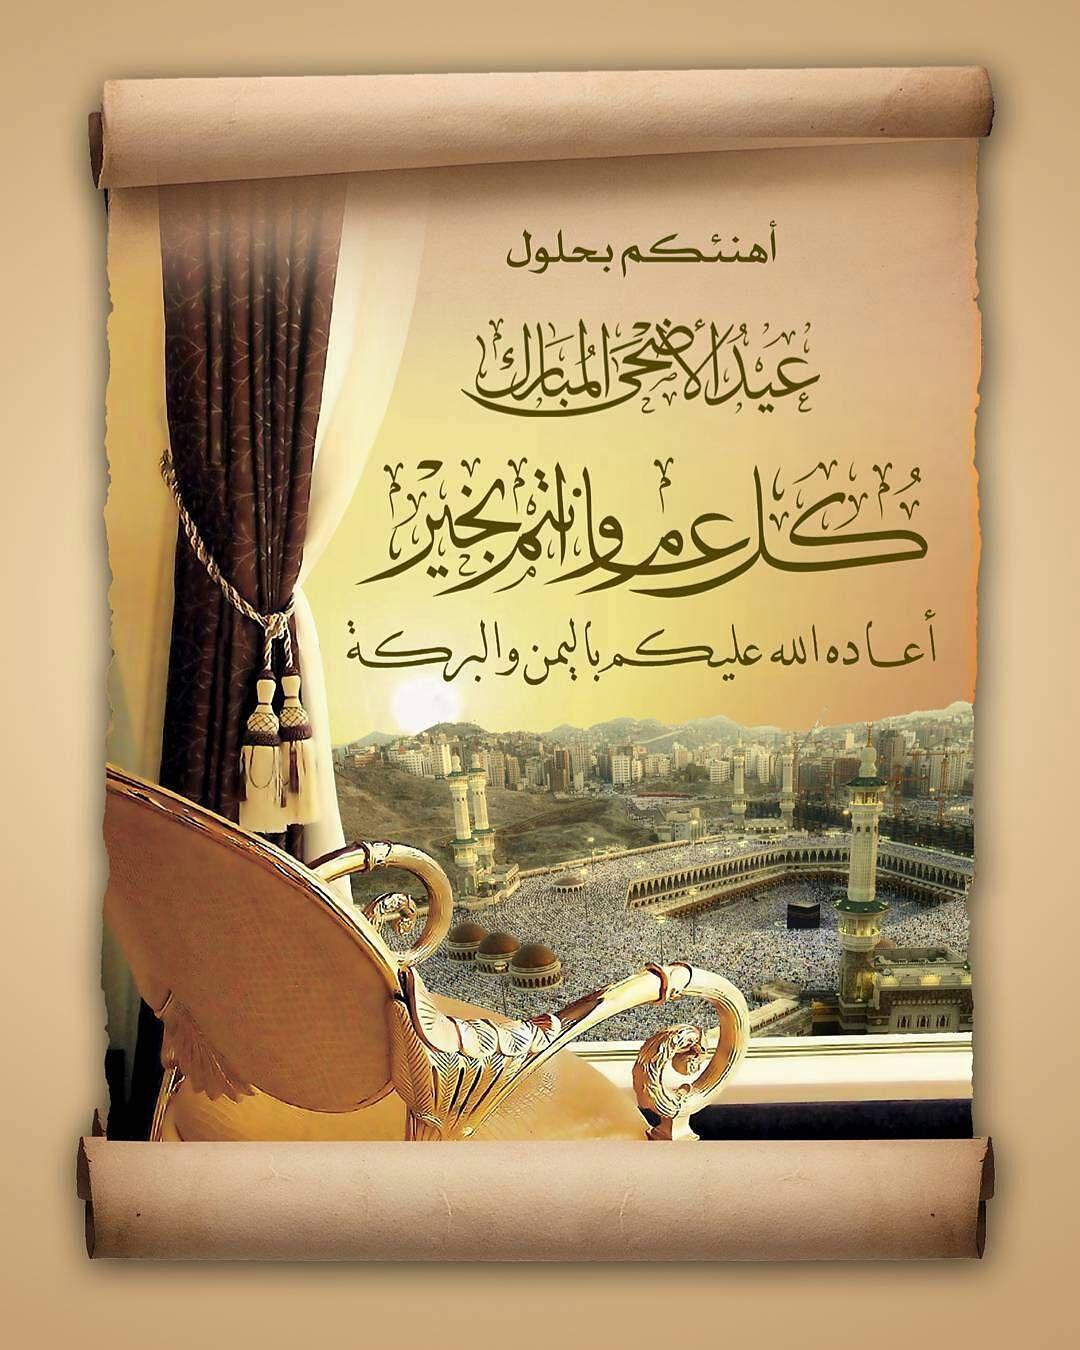 عصام الخالدي Eid Greetings Happy Eid Eid Mubarak Greetings